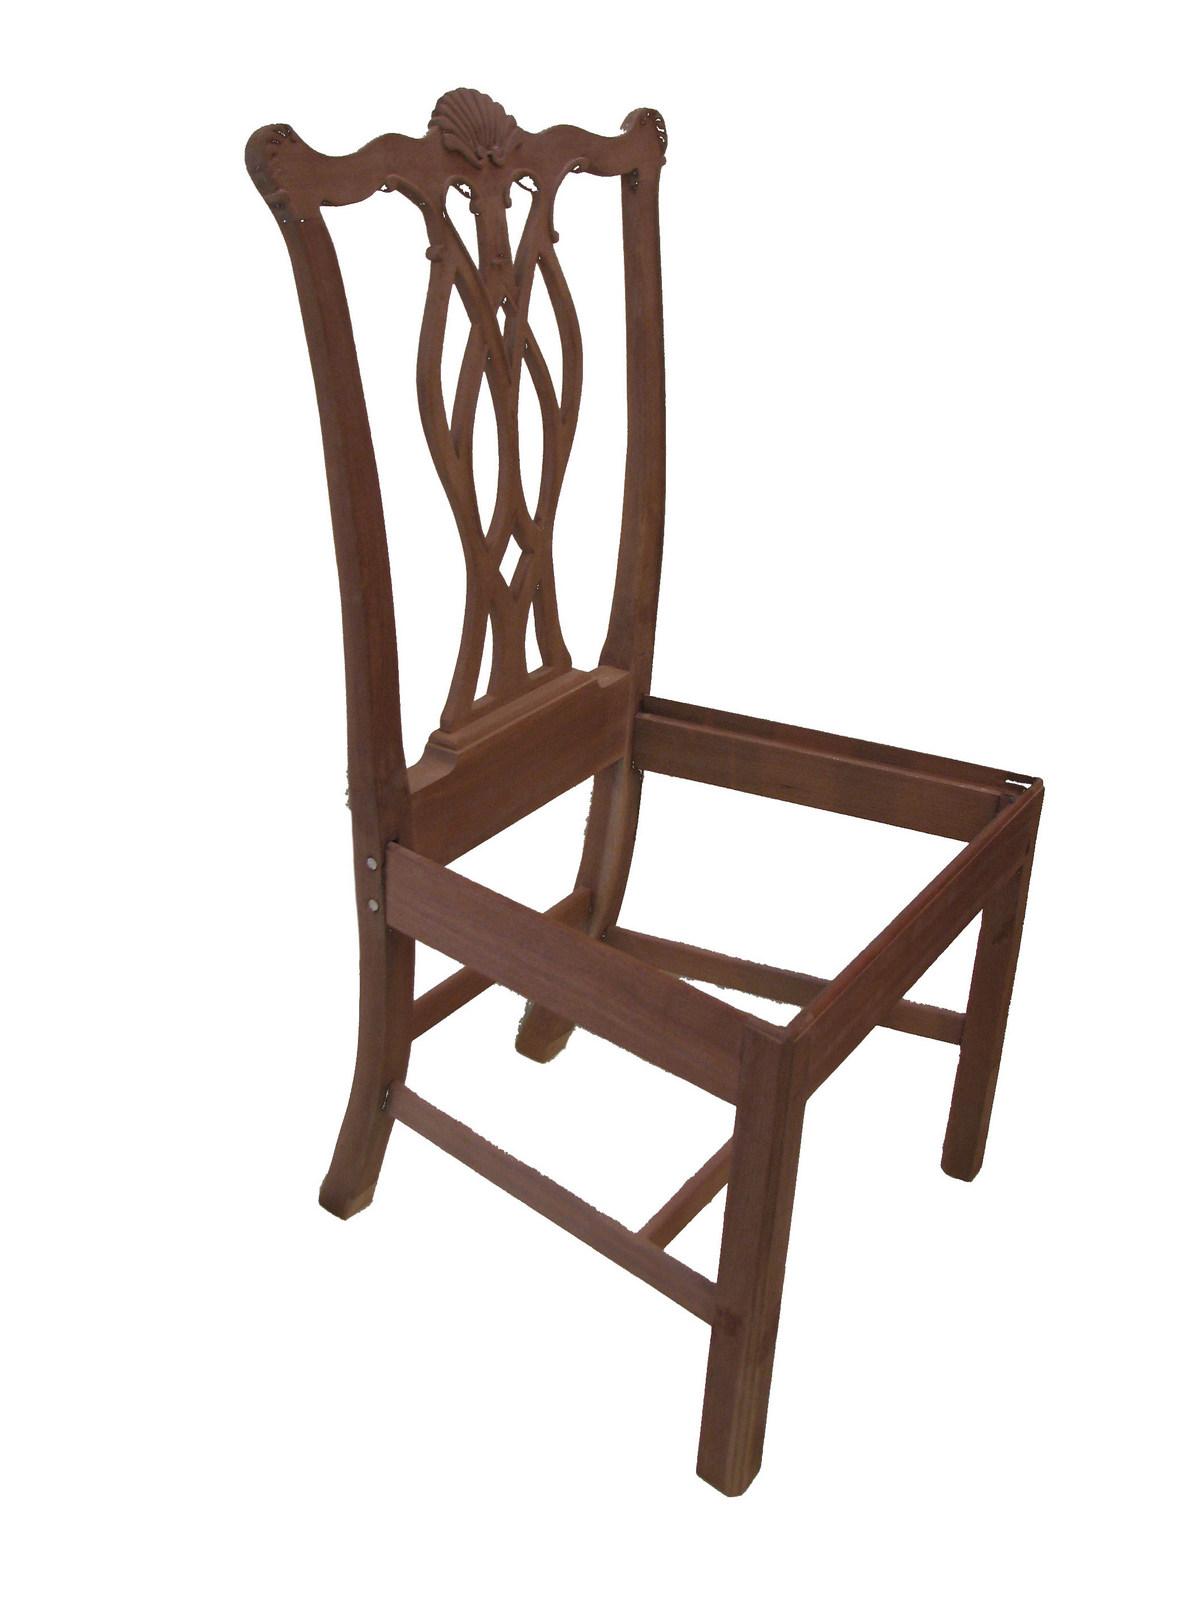 05-chair copy.JPG